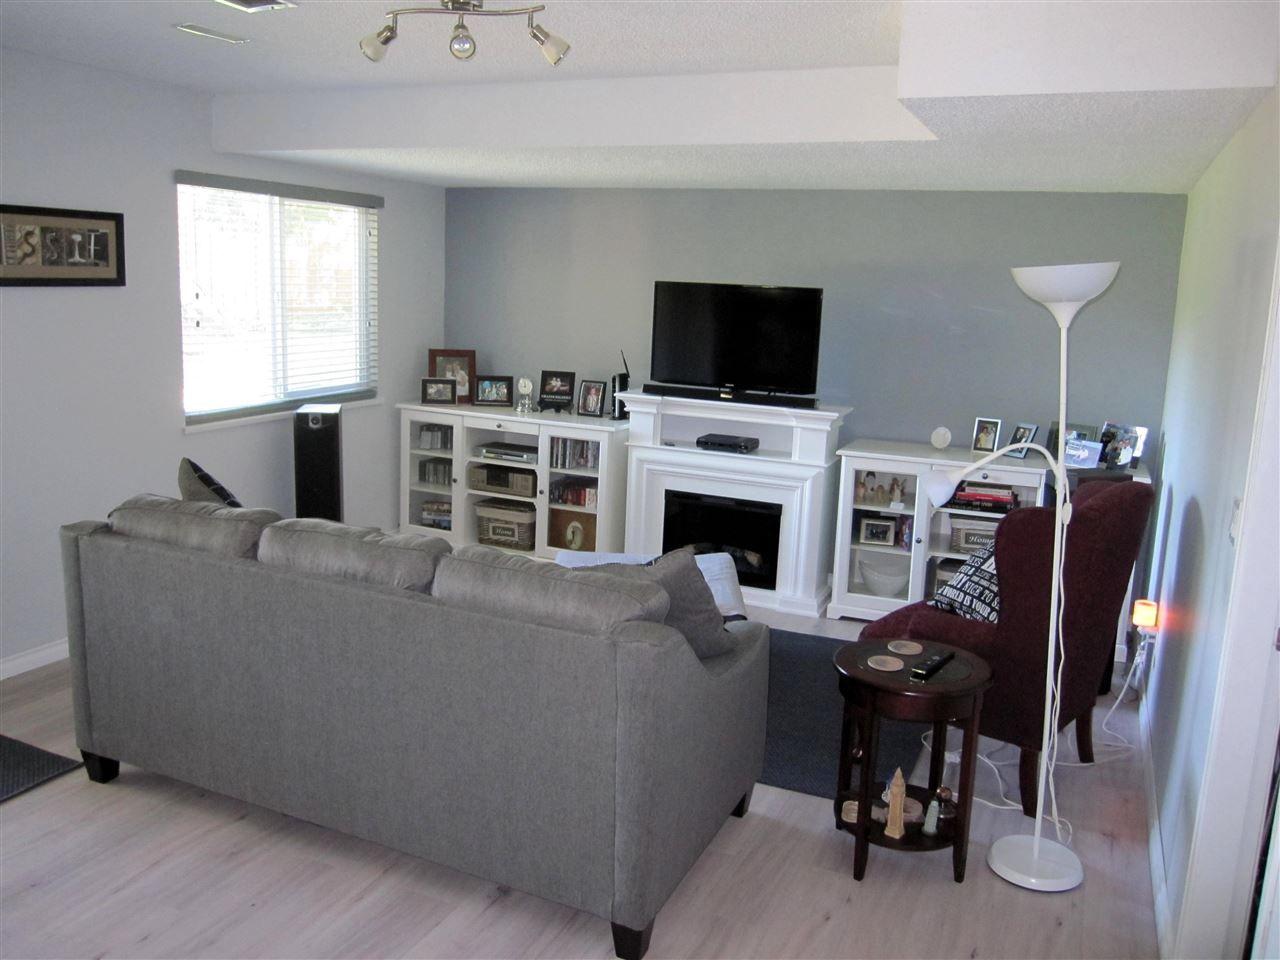 Photo 7: Photos: 21155 CUTLER Place in Maple Ridge: Southwest Maple Ridge House for sale : MLS®# R2101980